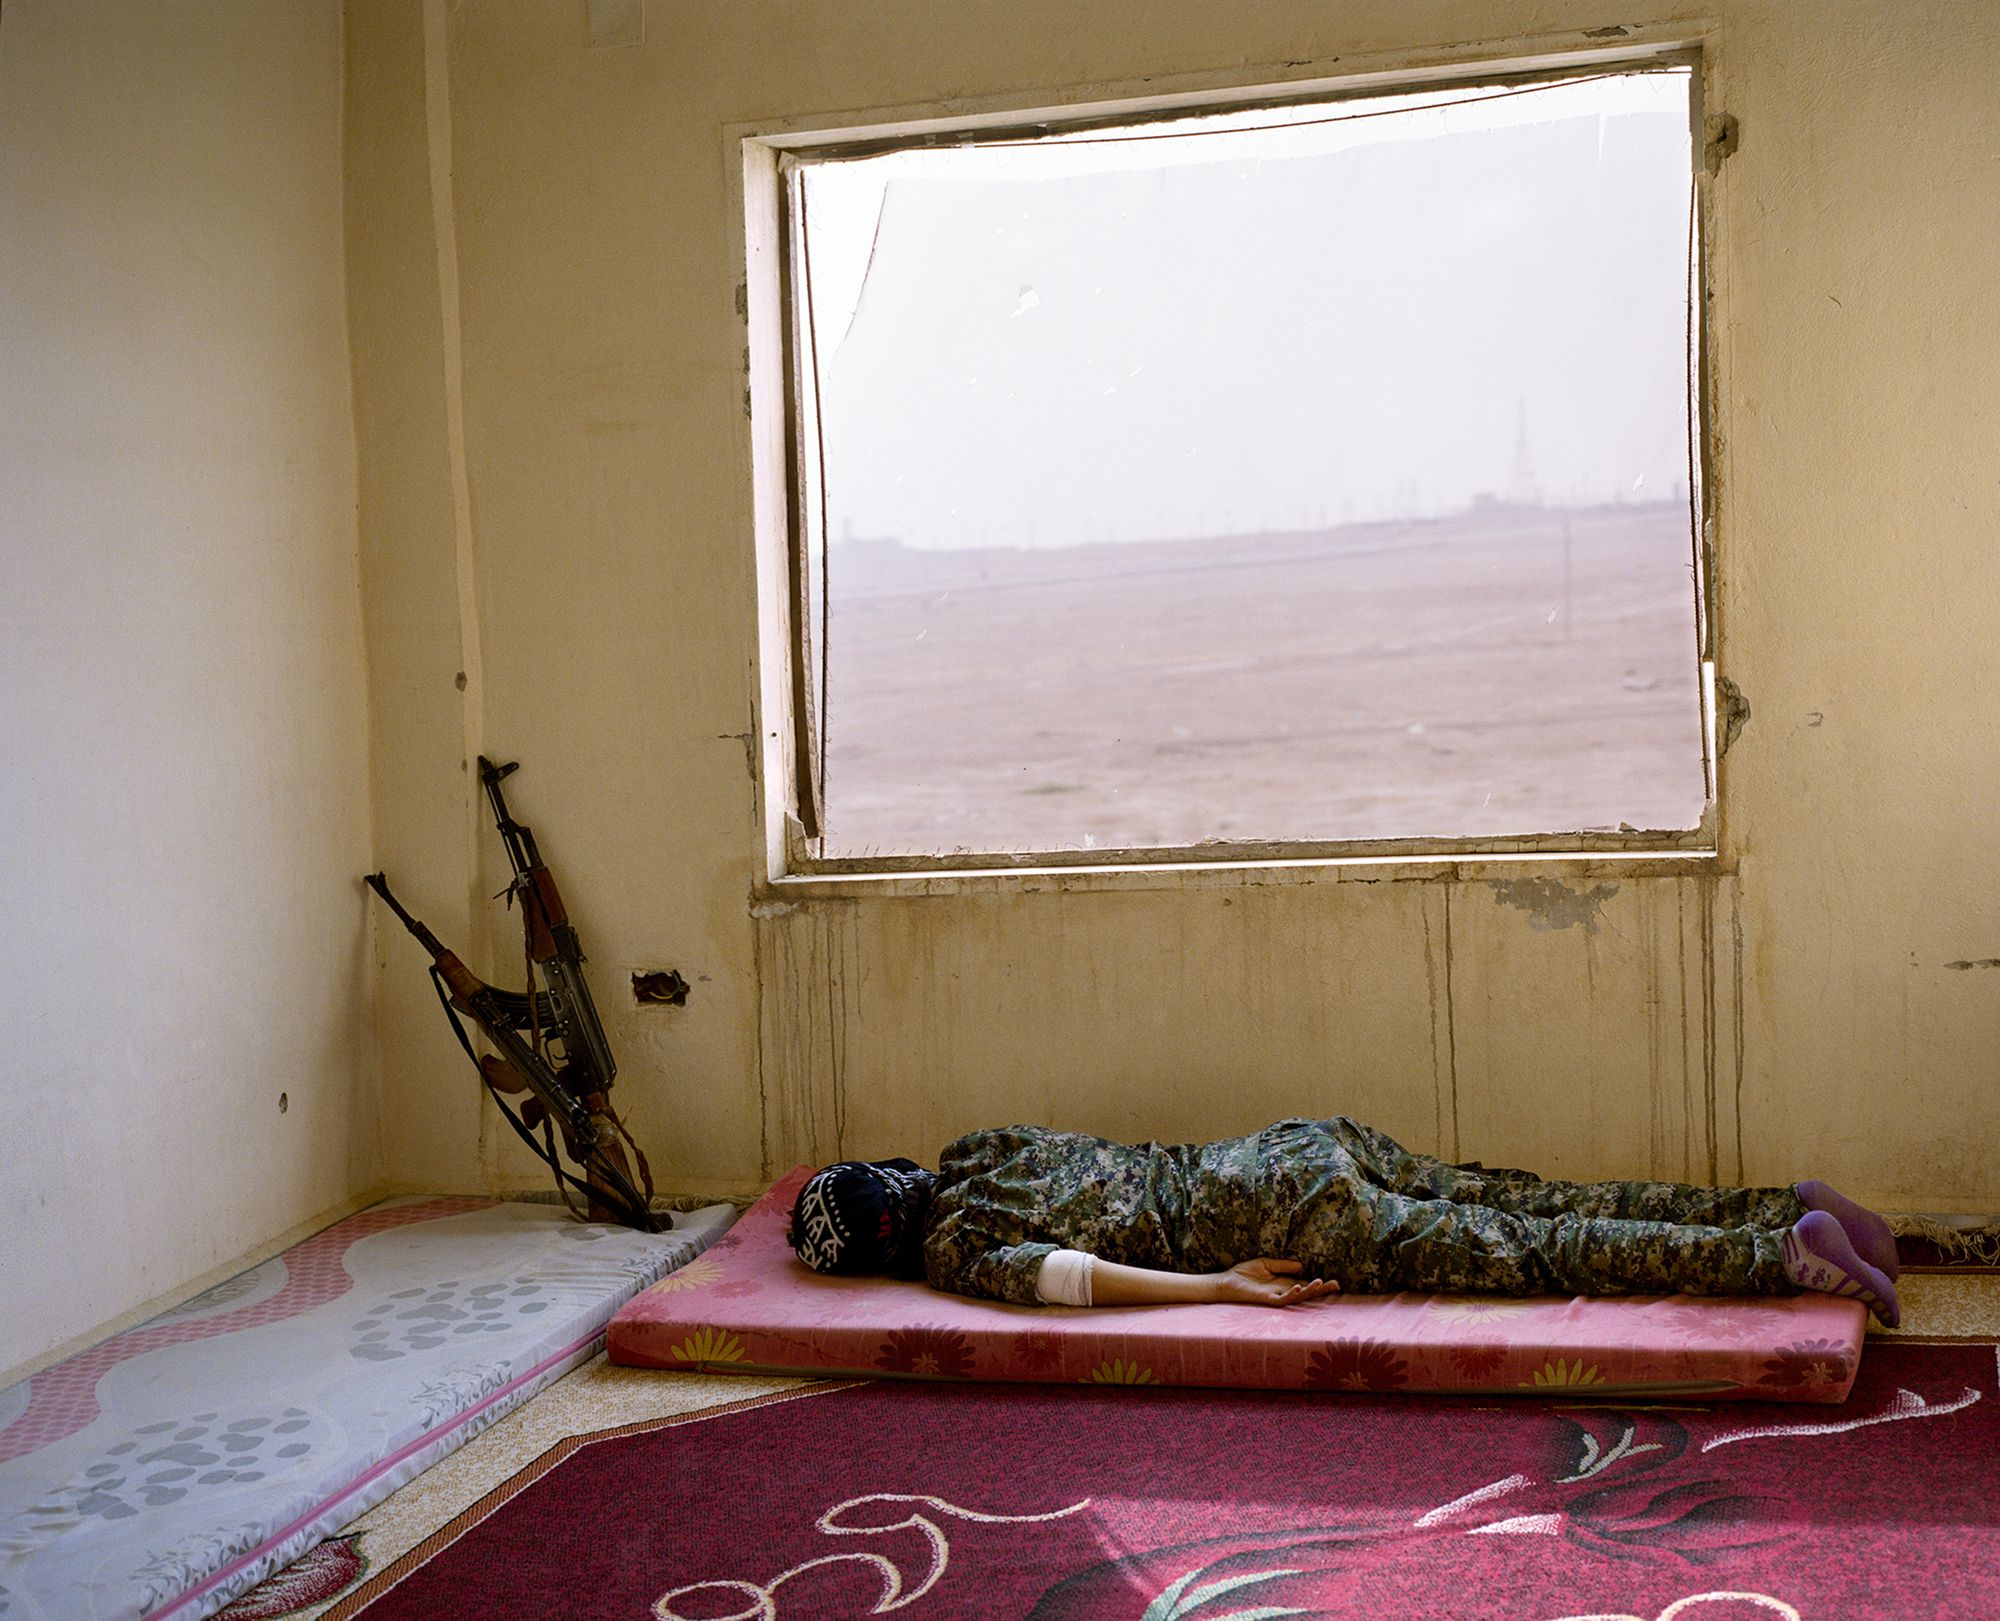 Jin - Jiyan - Azadi: Women, Life, Freedom - Photographs by Sonja